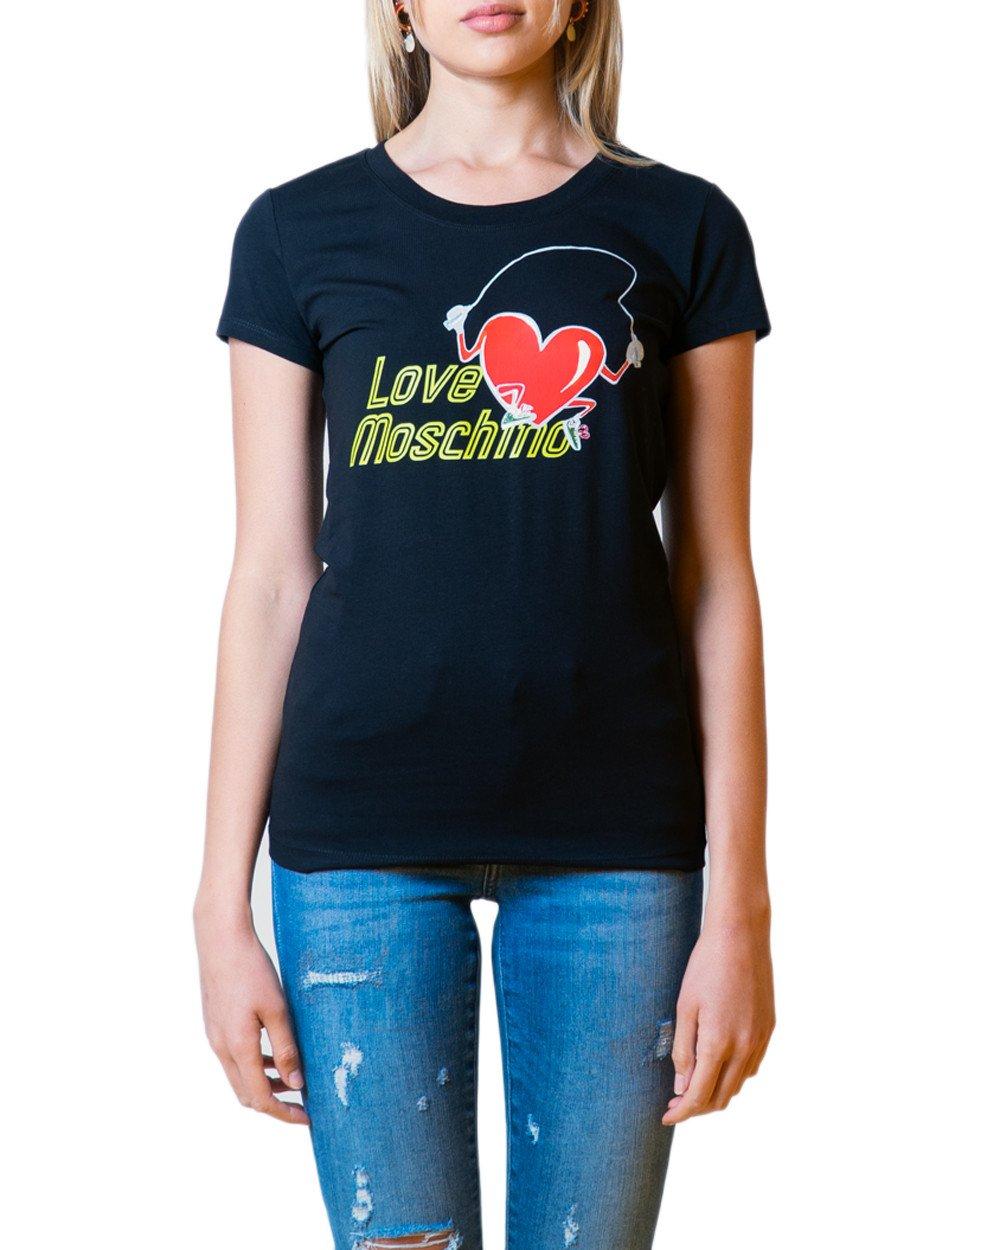 Love Moschino Women's T-Shirt Various Colours 175779 - black 38